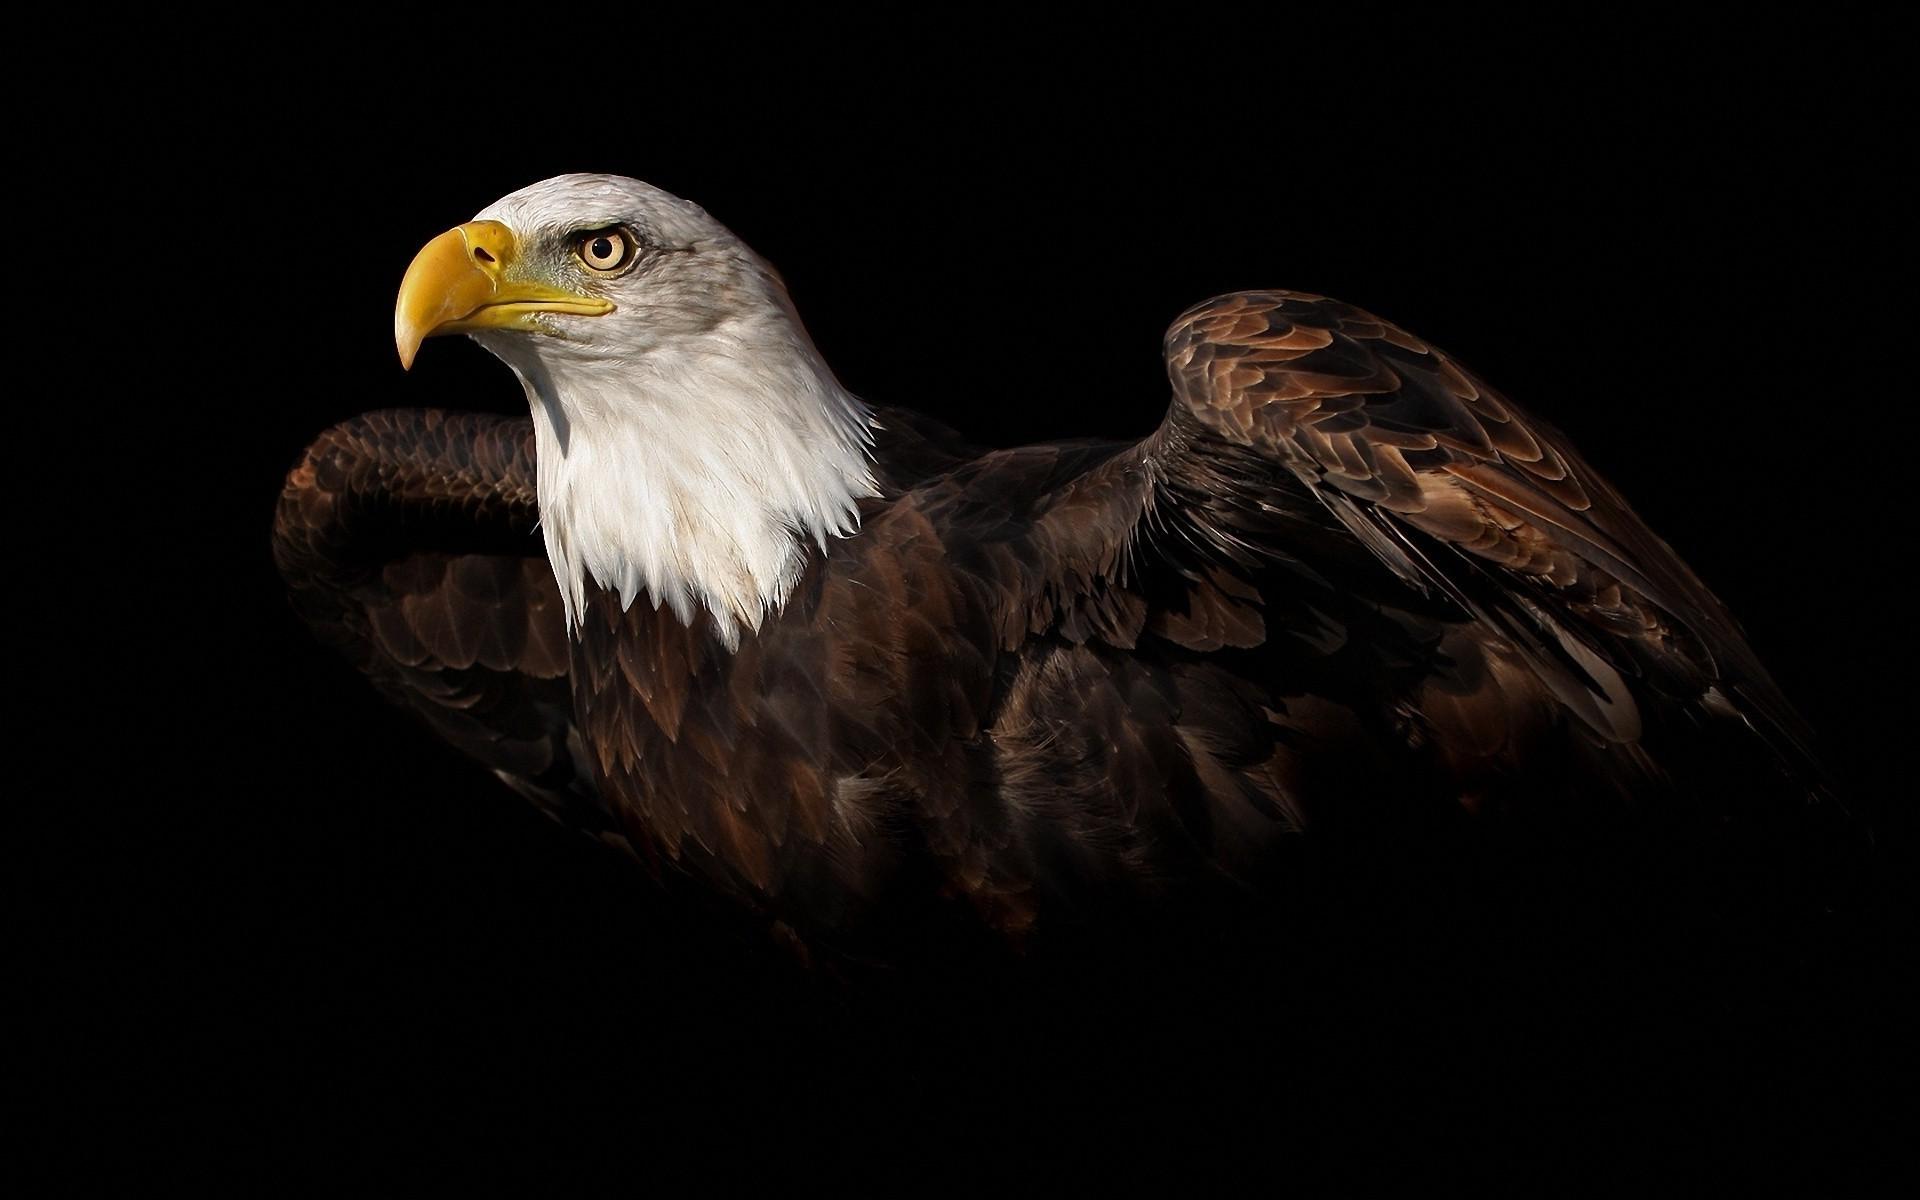 High Resolution Eagle Hd 1920x1200 Download Hd Wallpaper Wallpapertip